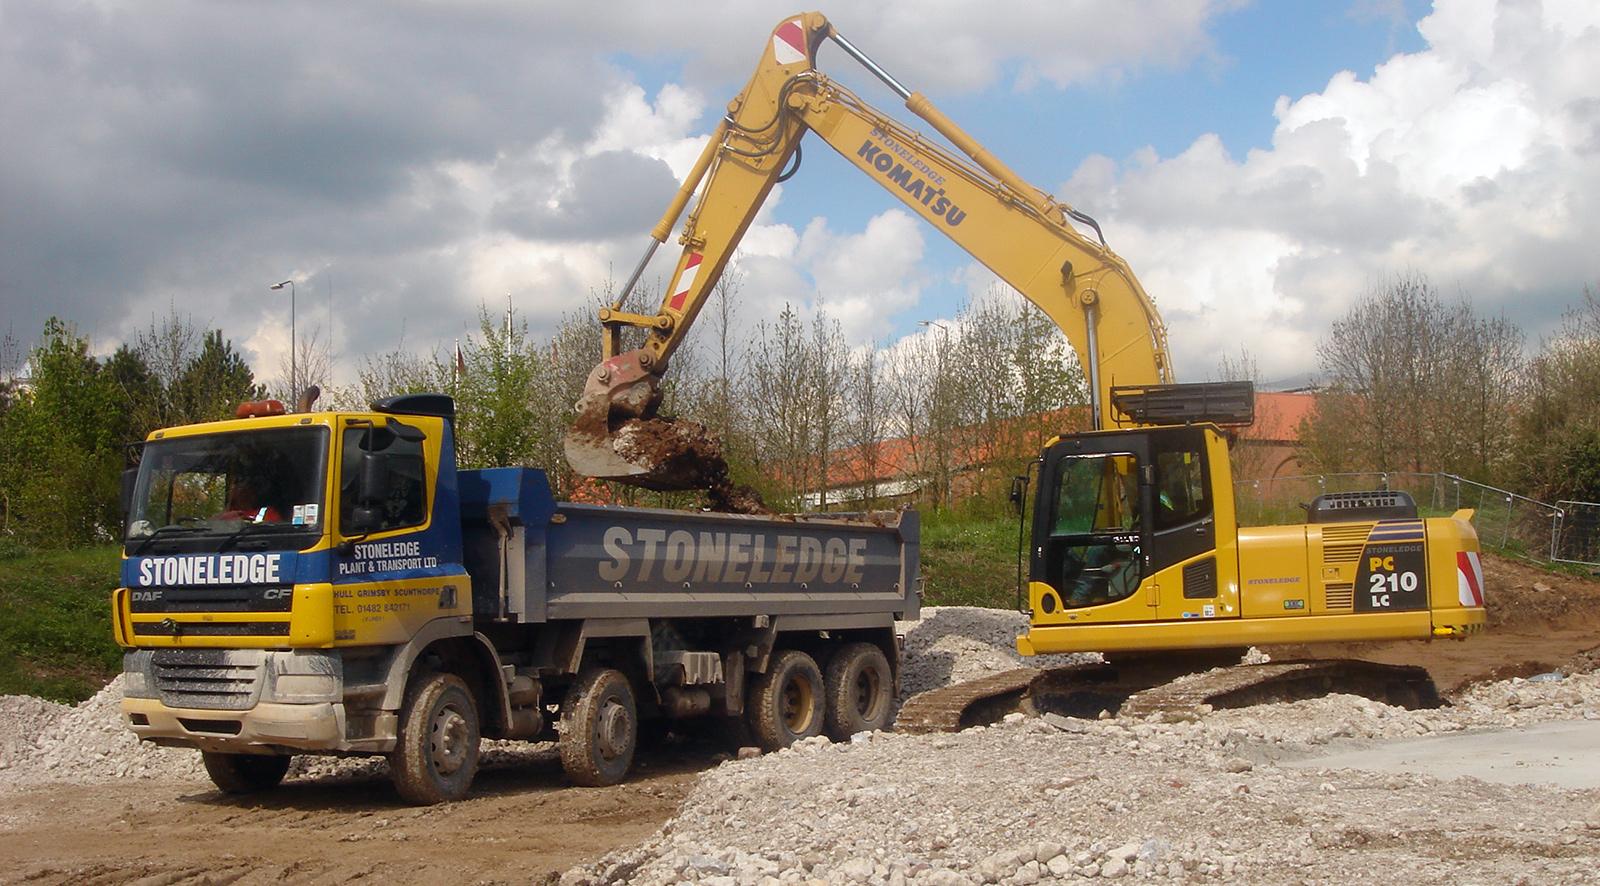 Stoneledge Plant & Transport